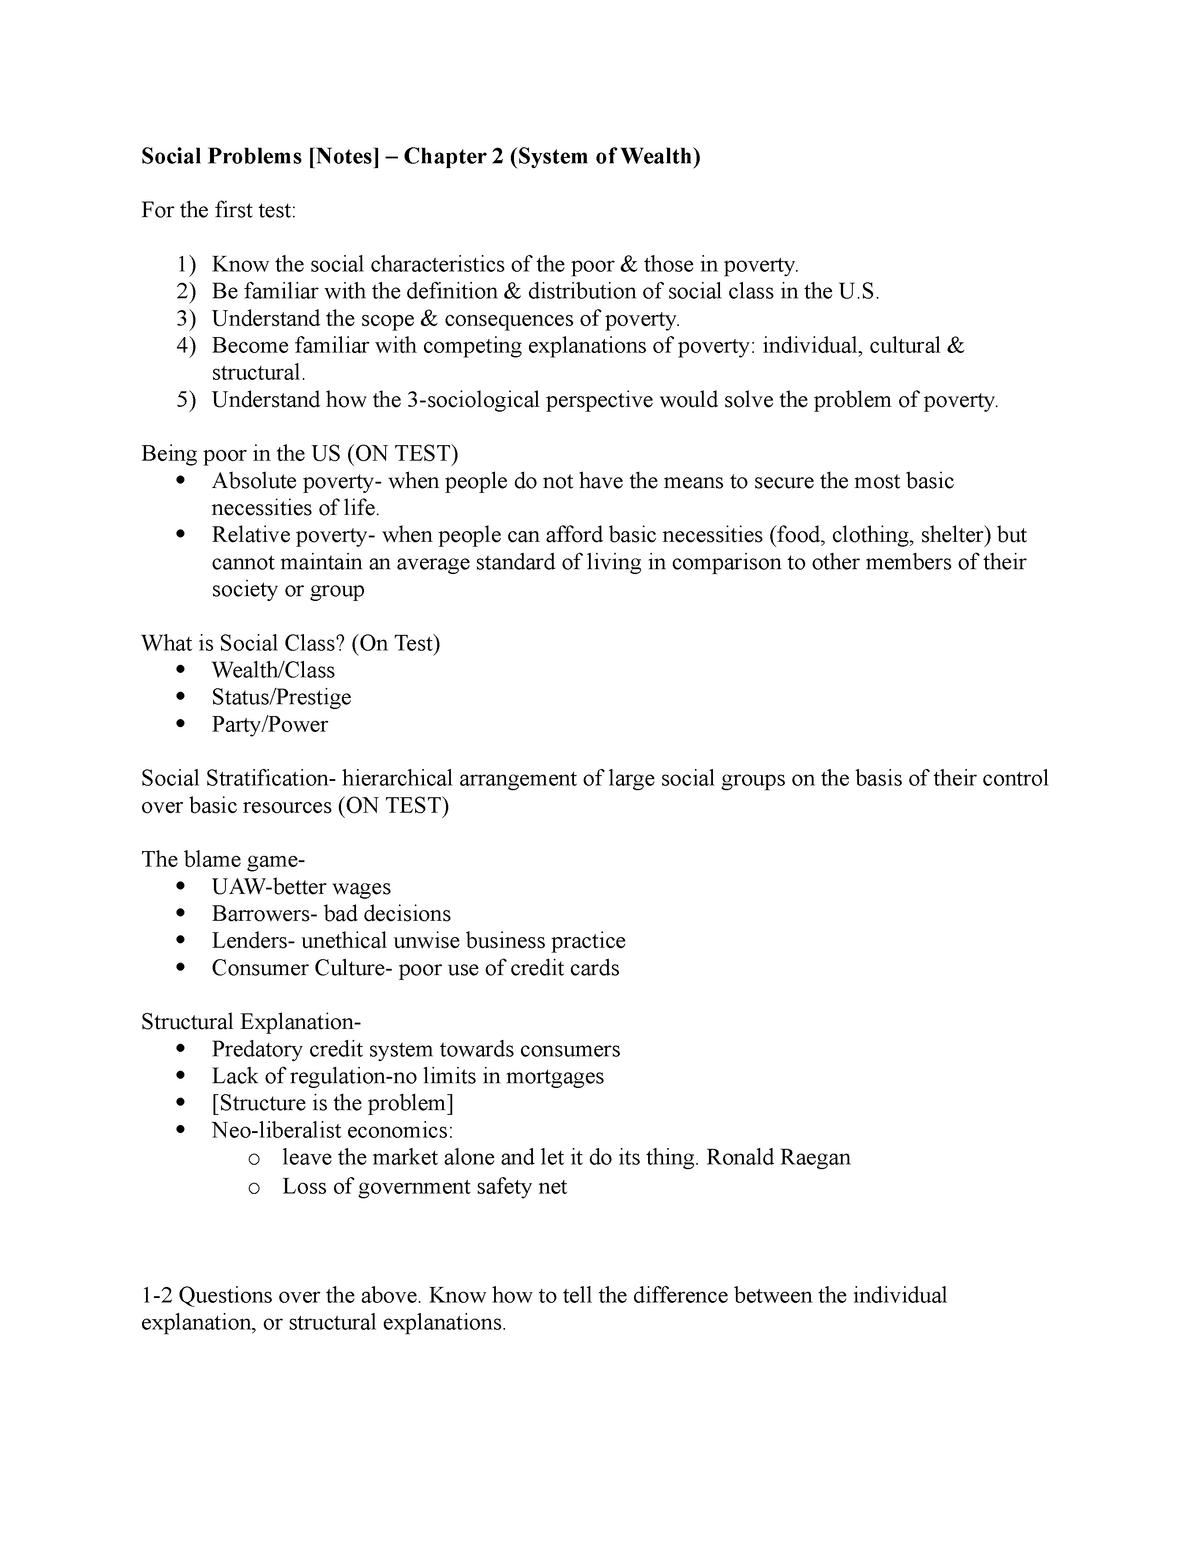 Social Problems [Notes] - Chapter 2 - SOC 1306 - StuDocu